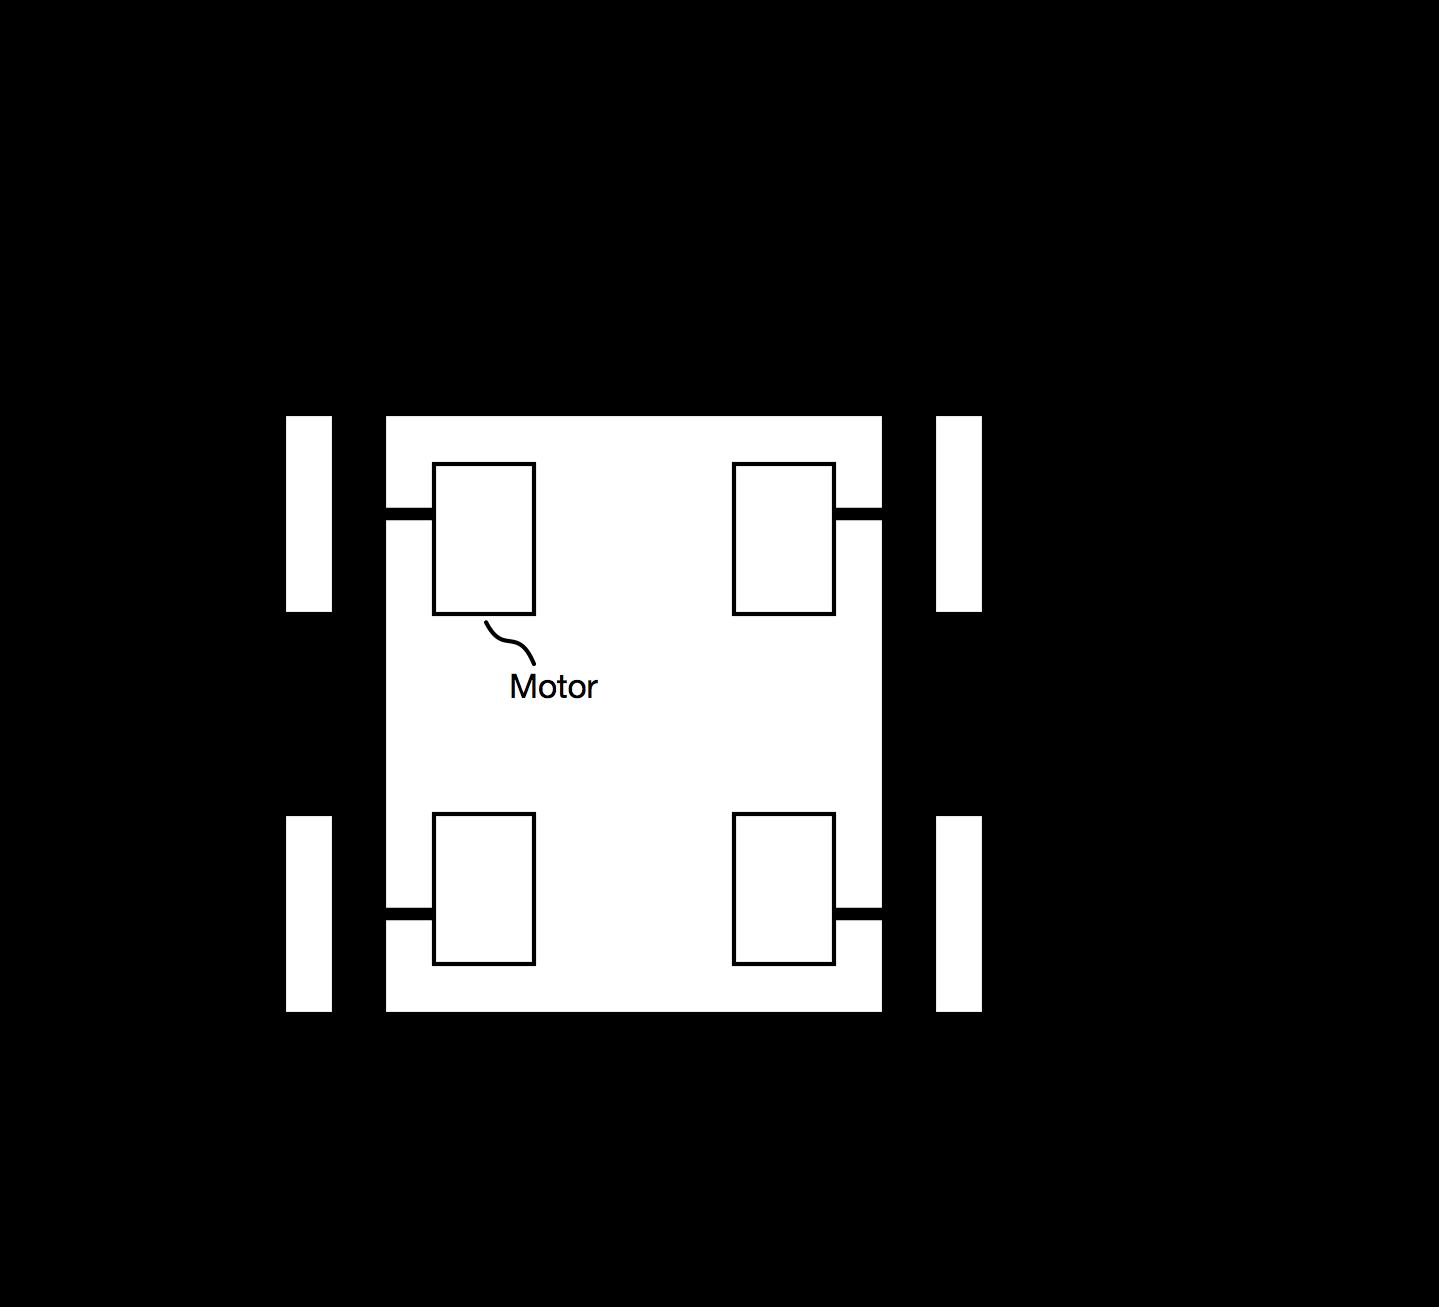 robot_diagram